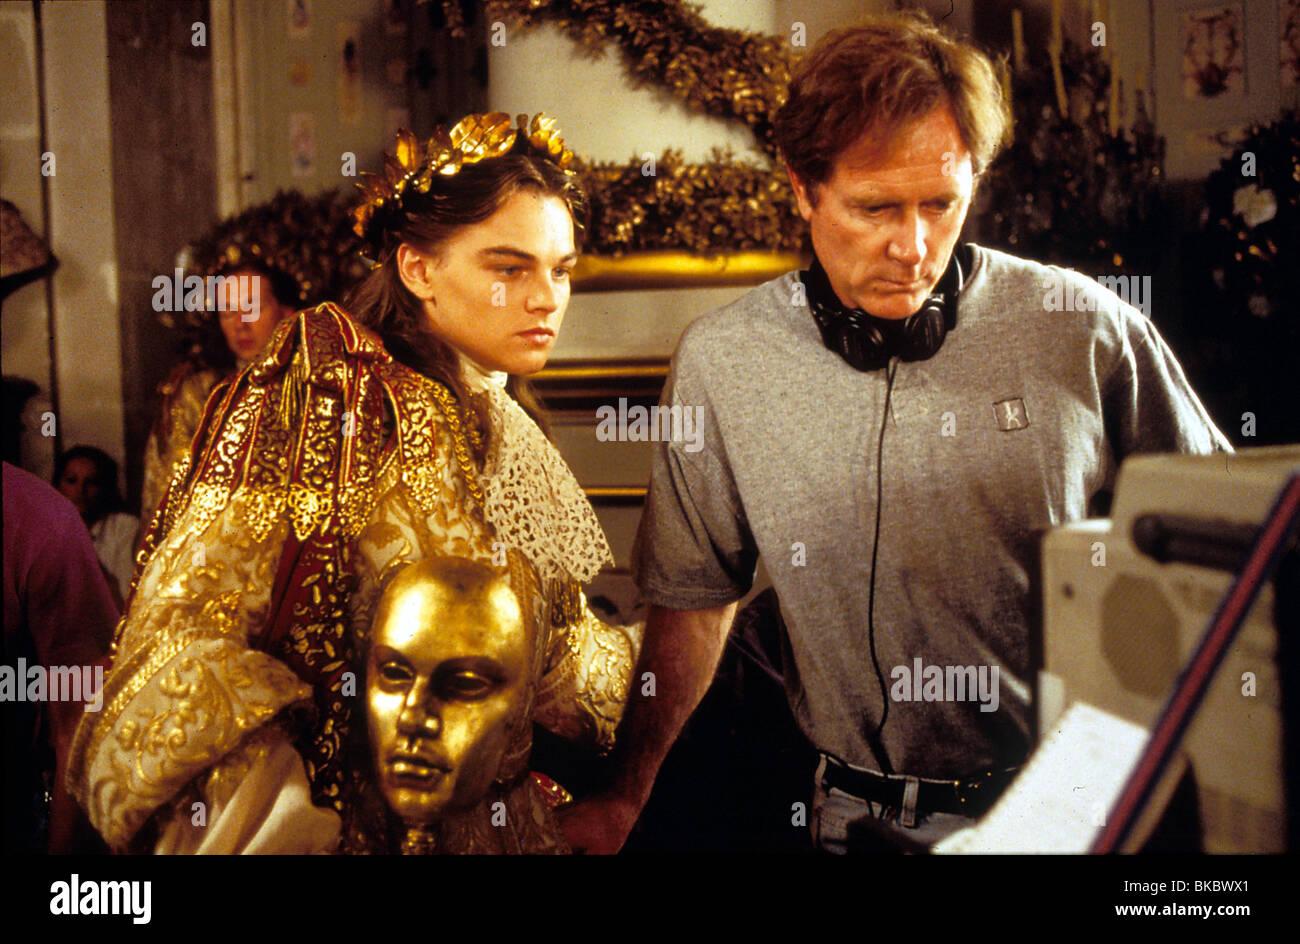 Randall Wallace Dir S O El Hombre De La Mascara De Hierro 1998